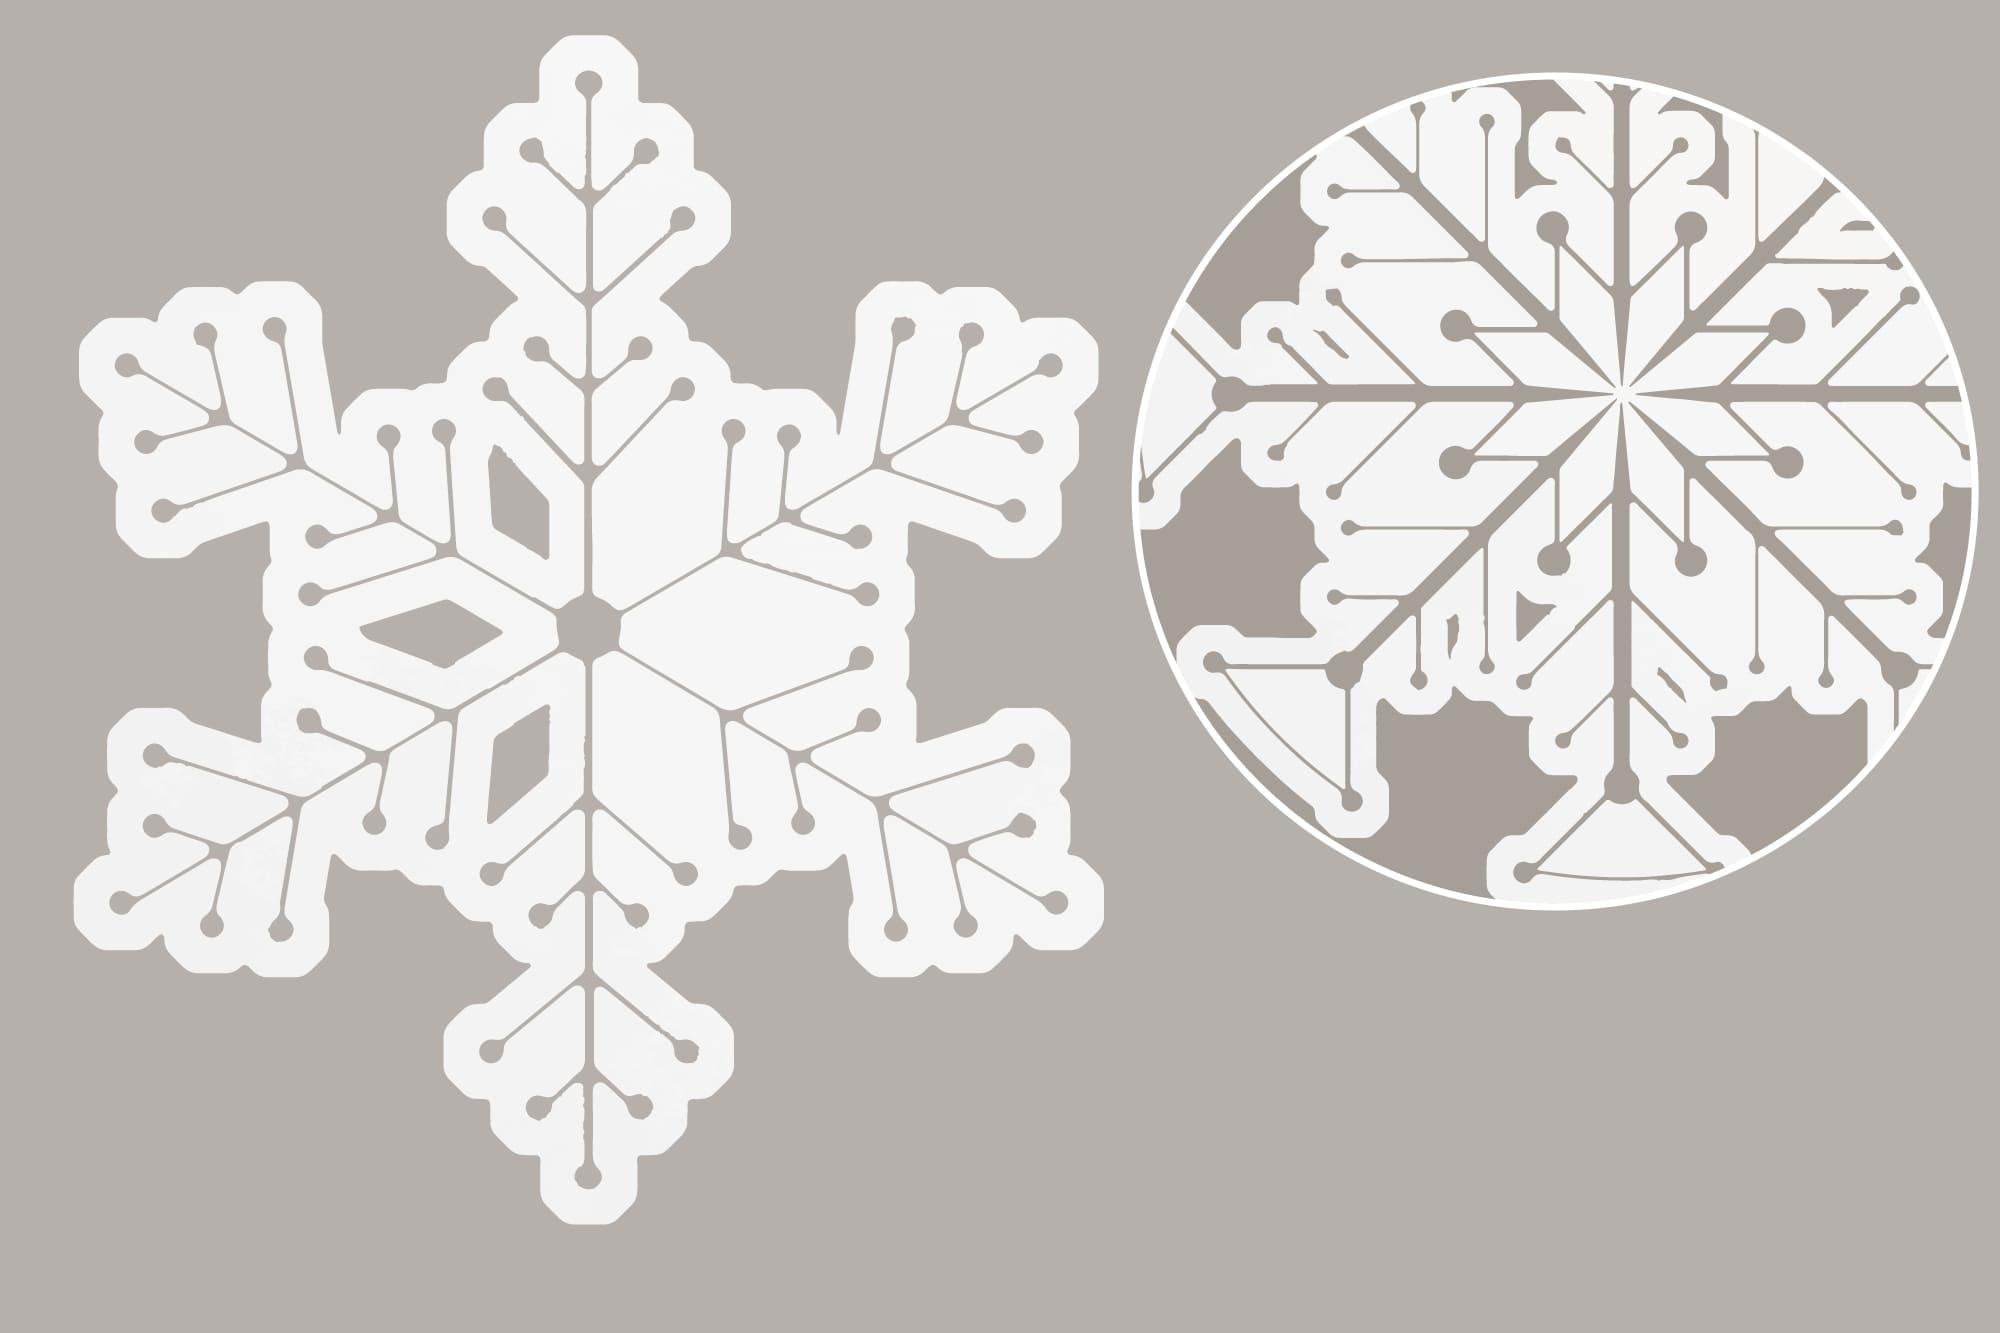 496 Christmas Illustrations: Christmas Vectors Bundle SVG, EPS, AI - Snowflakes 3b